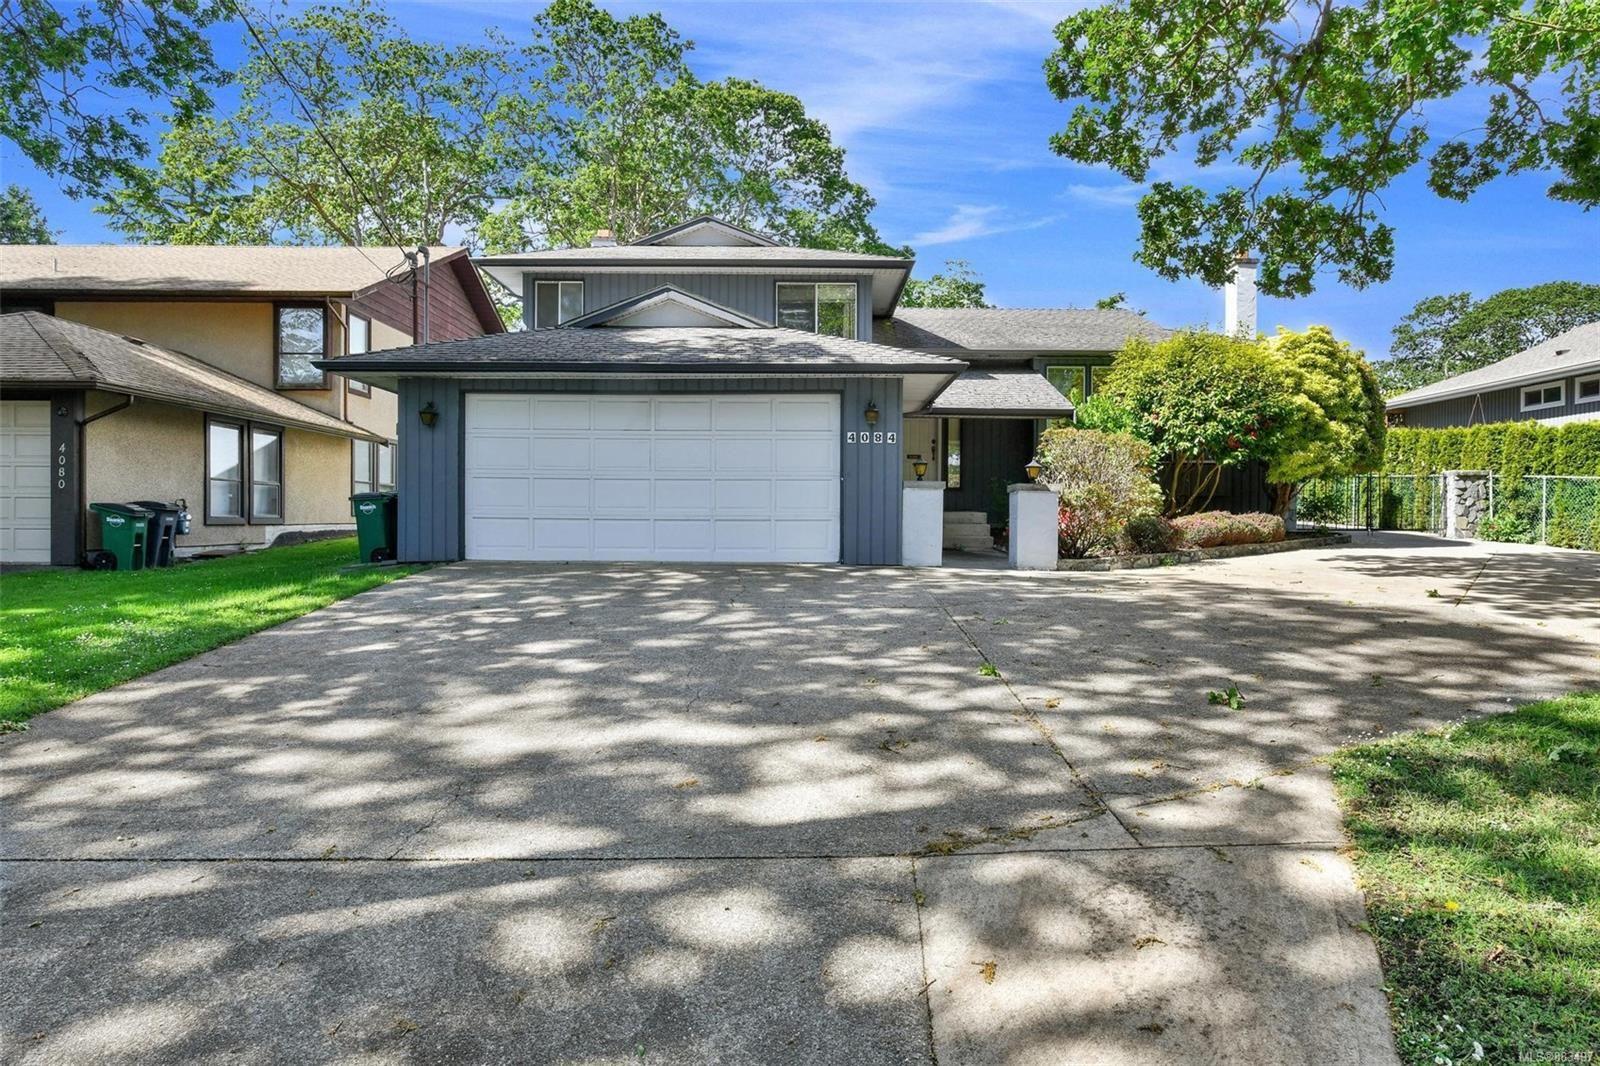 Main Photo: 4084 Cedar Hill Rd in : SE Mt Doug House for sale (Saanich East)  : MLS®# 883497